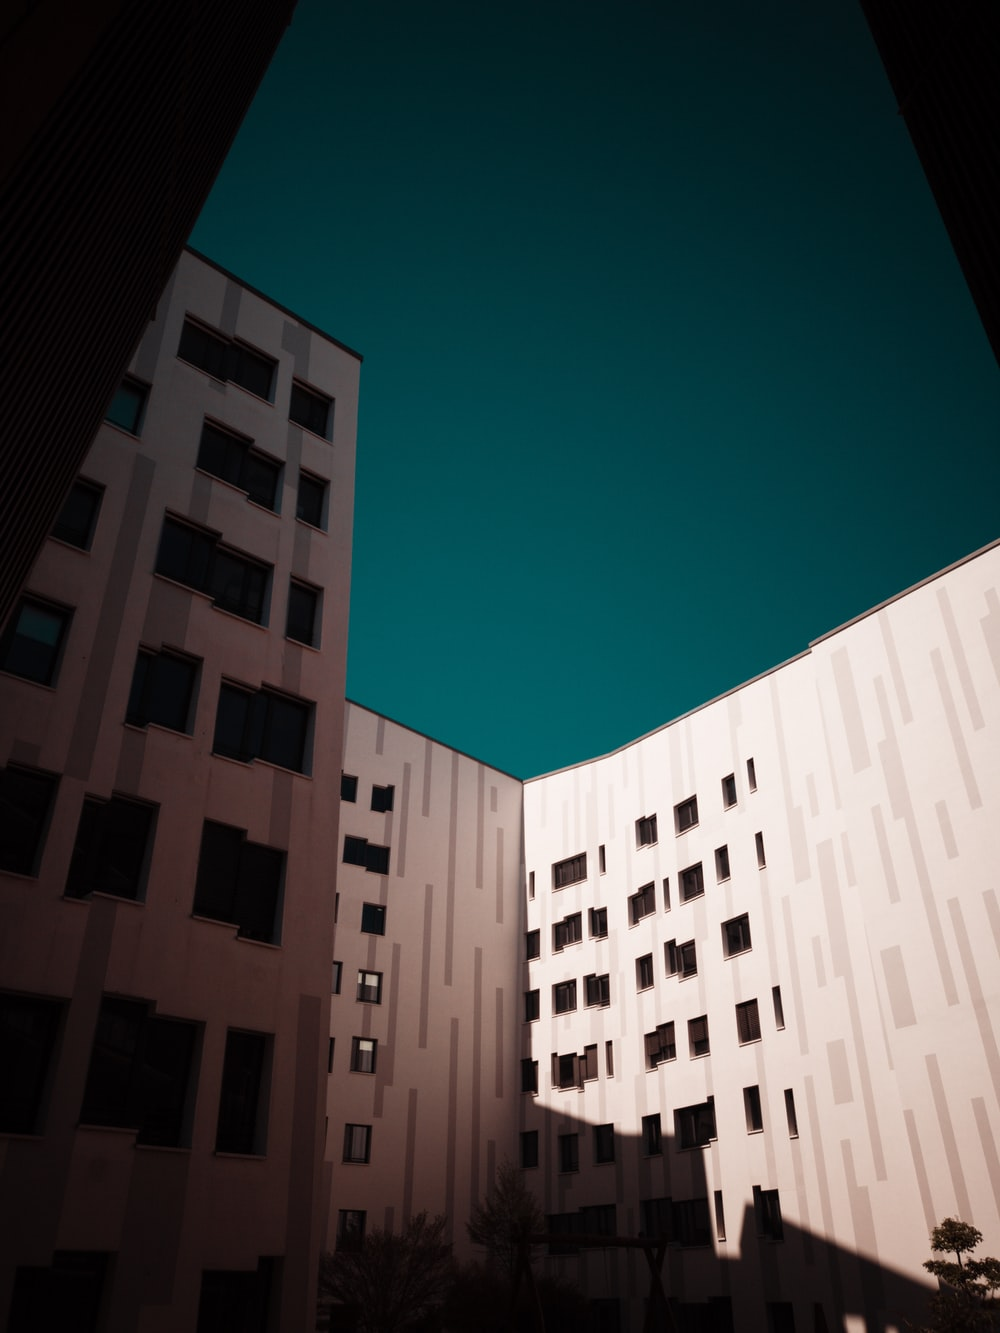 white and black concrete buildings